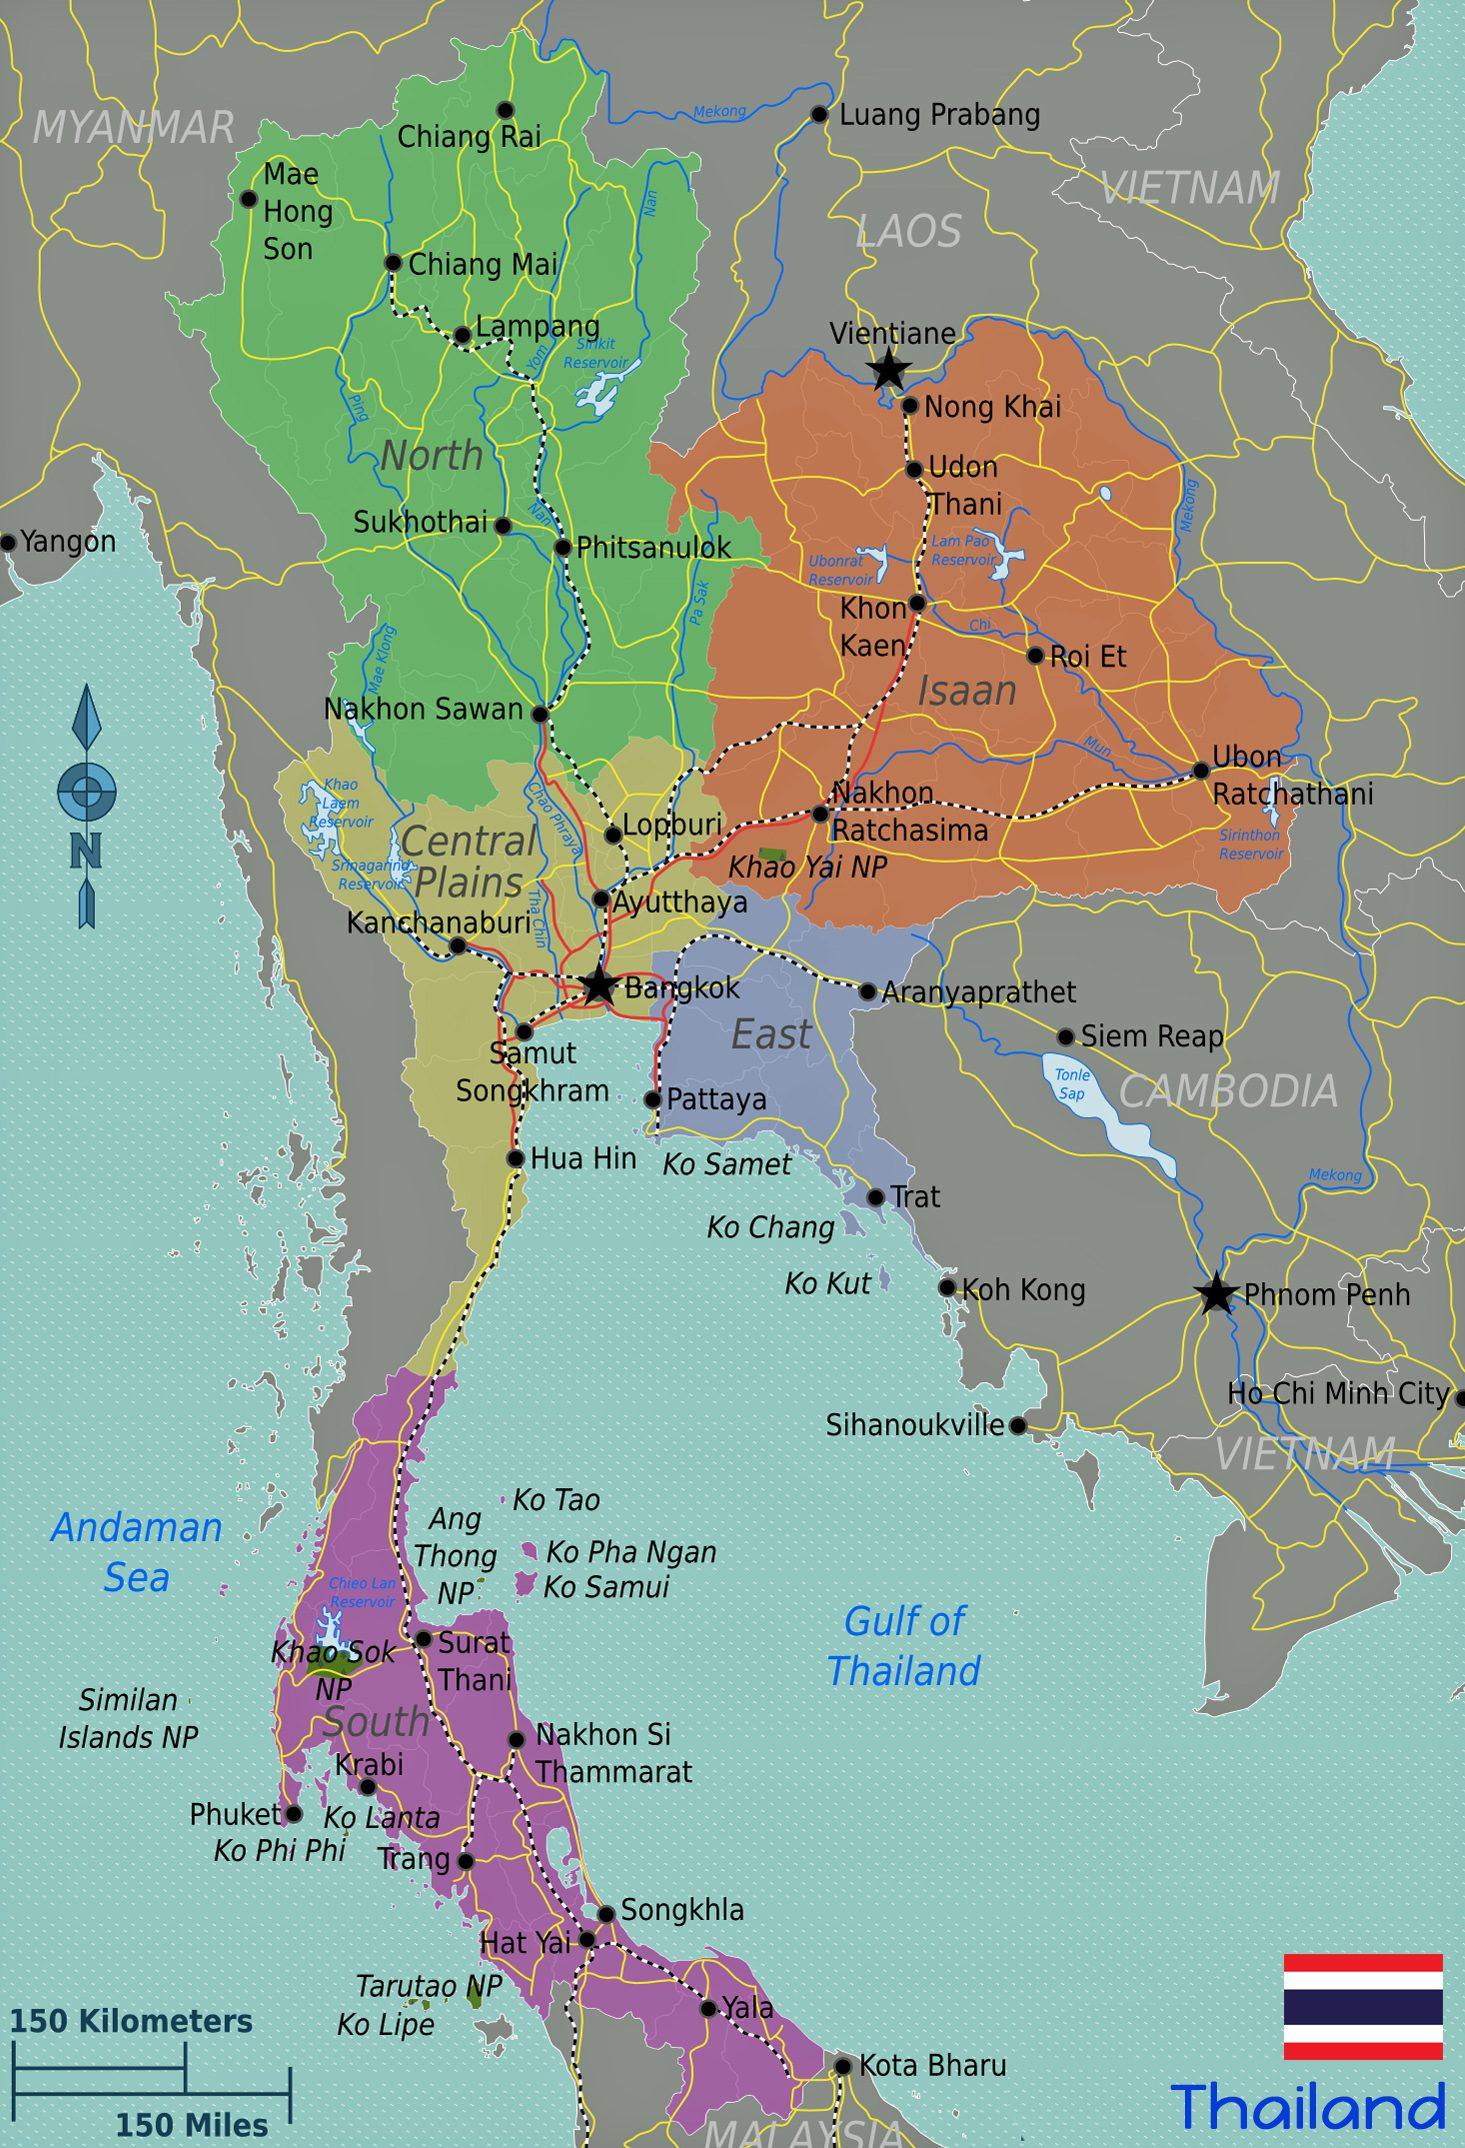 Vietnam Tours Map Thailand Quelle Wikitravel_bearbeitet-1